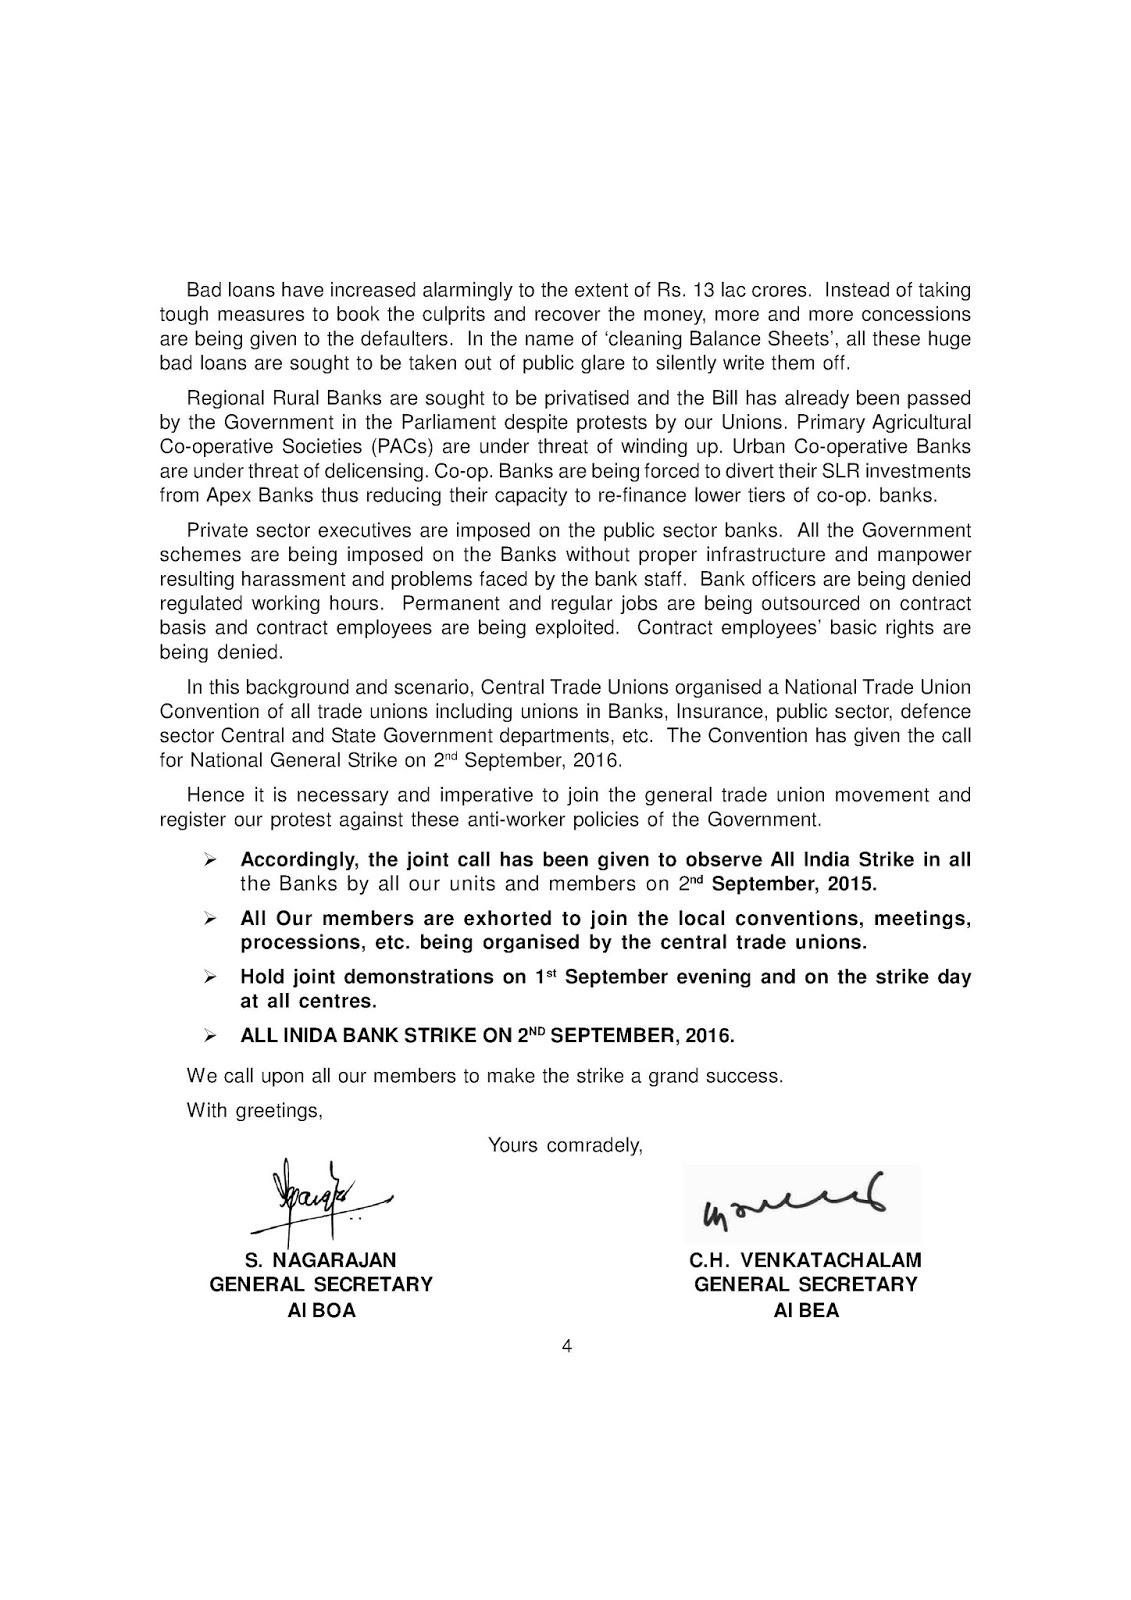 All India Bank Strike on 2nd September 2016